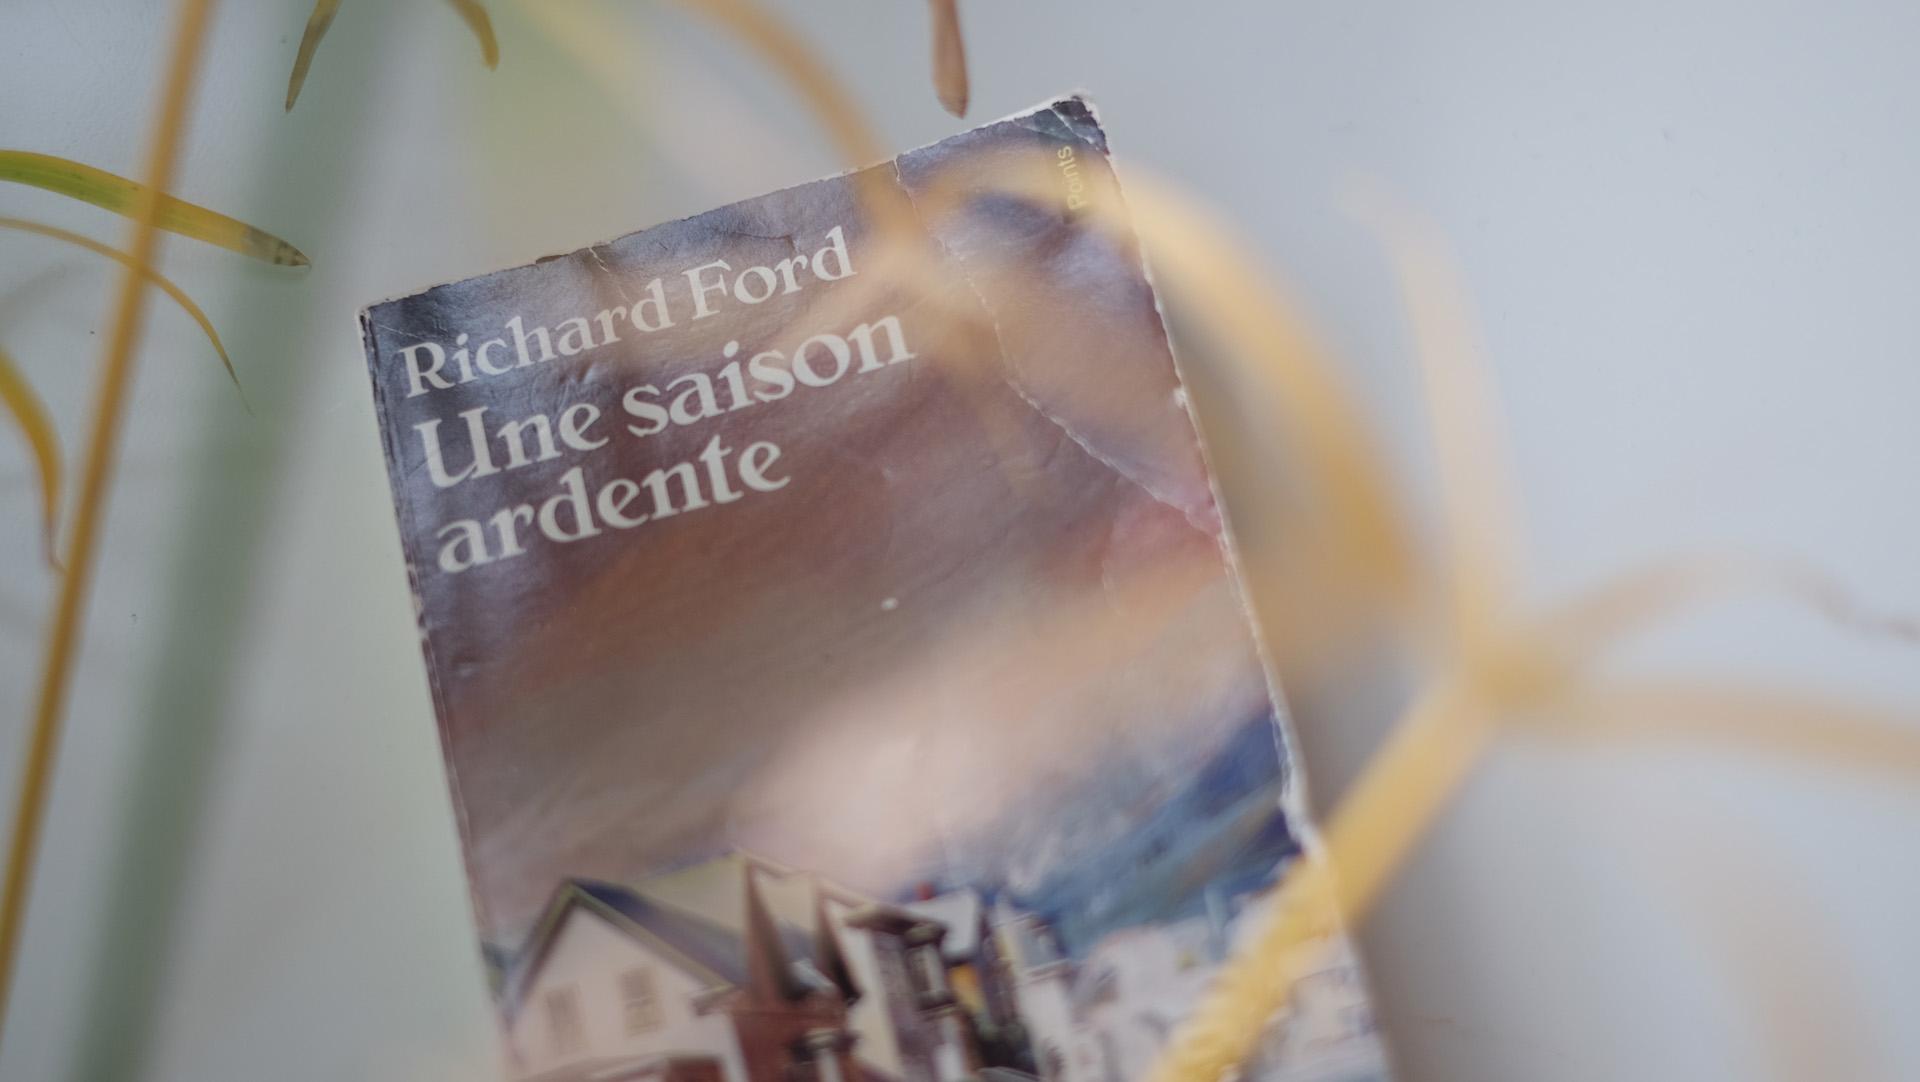 richard_ford_une_saison_ardente